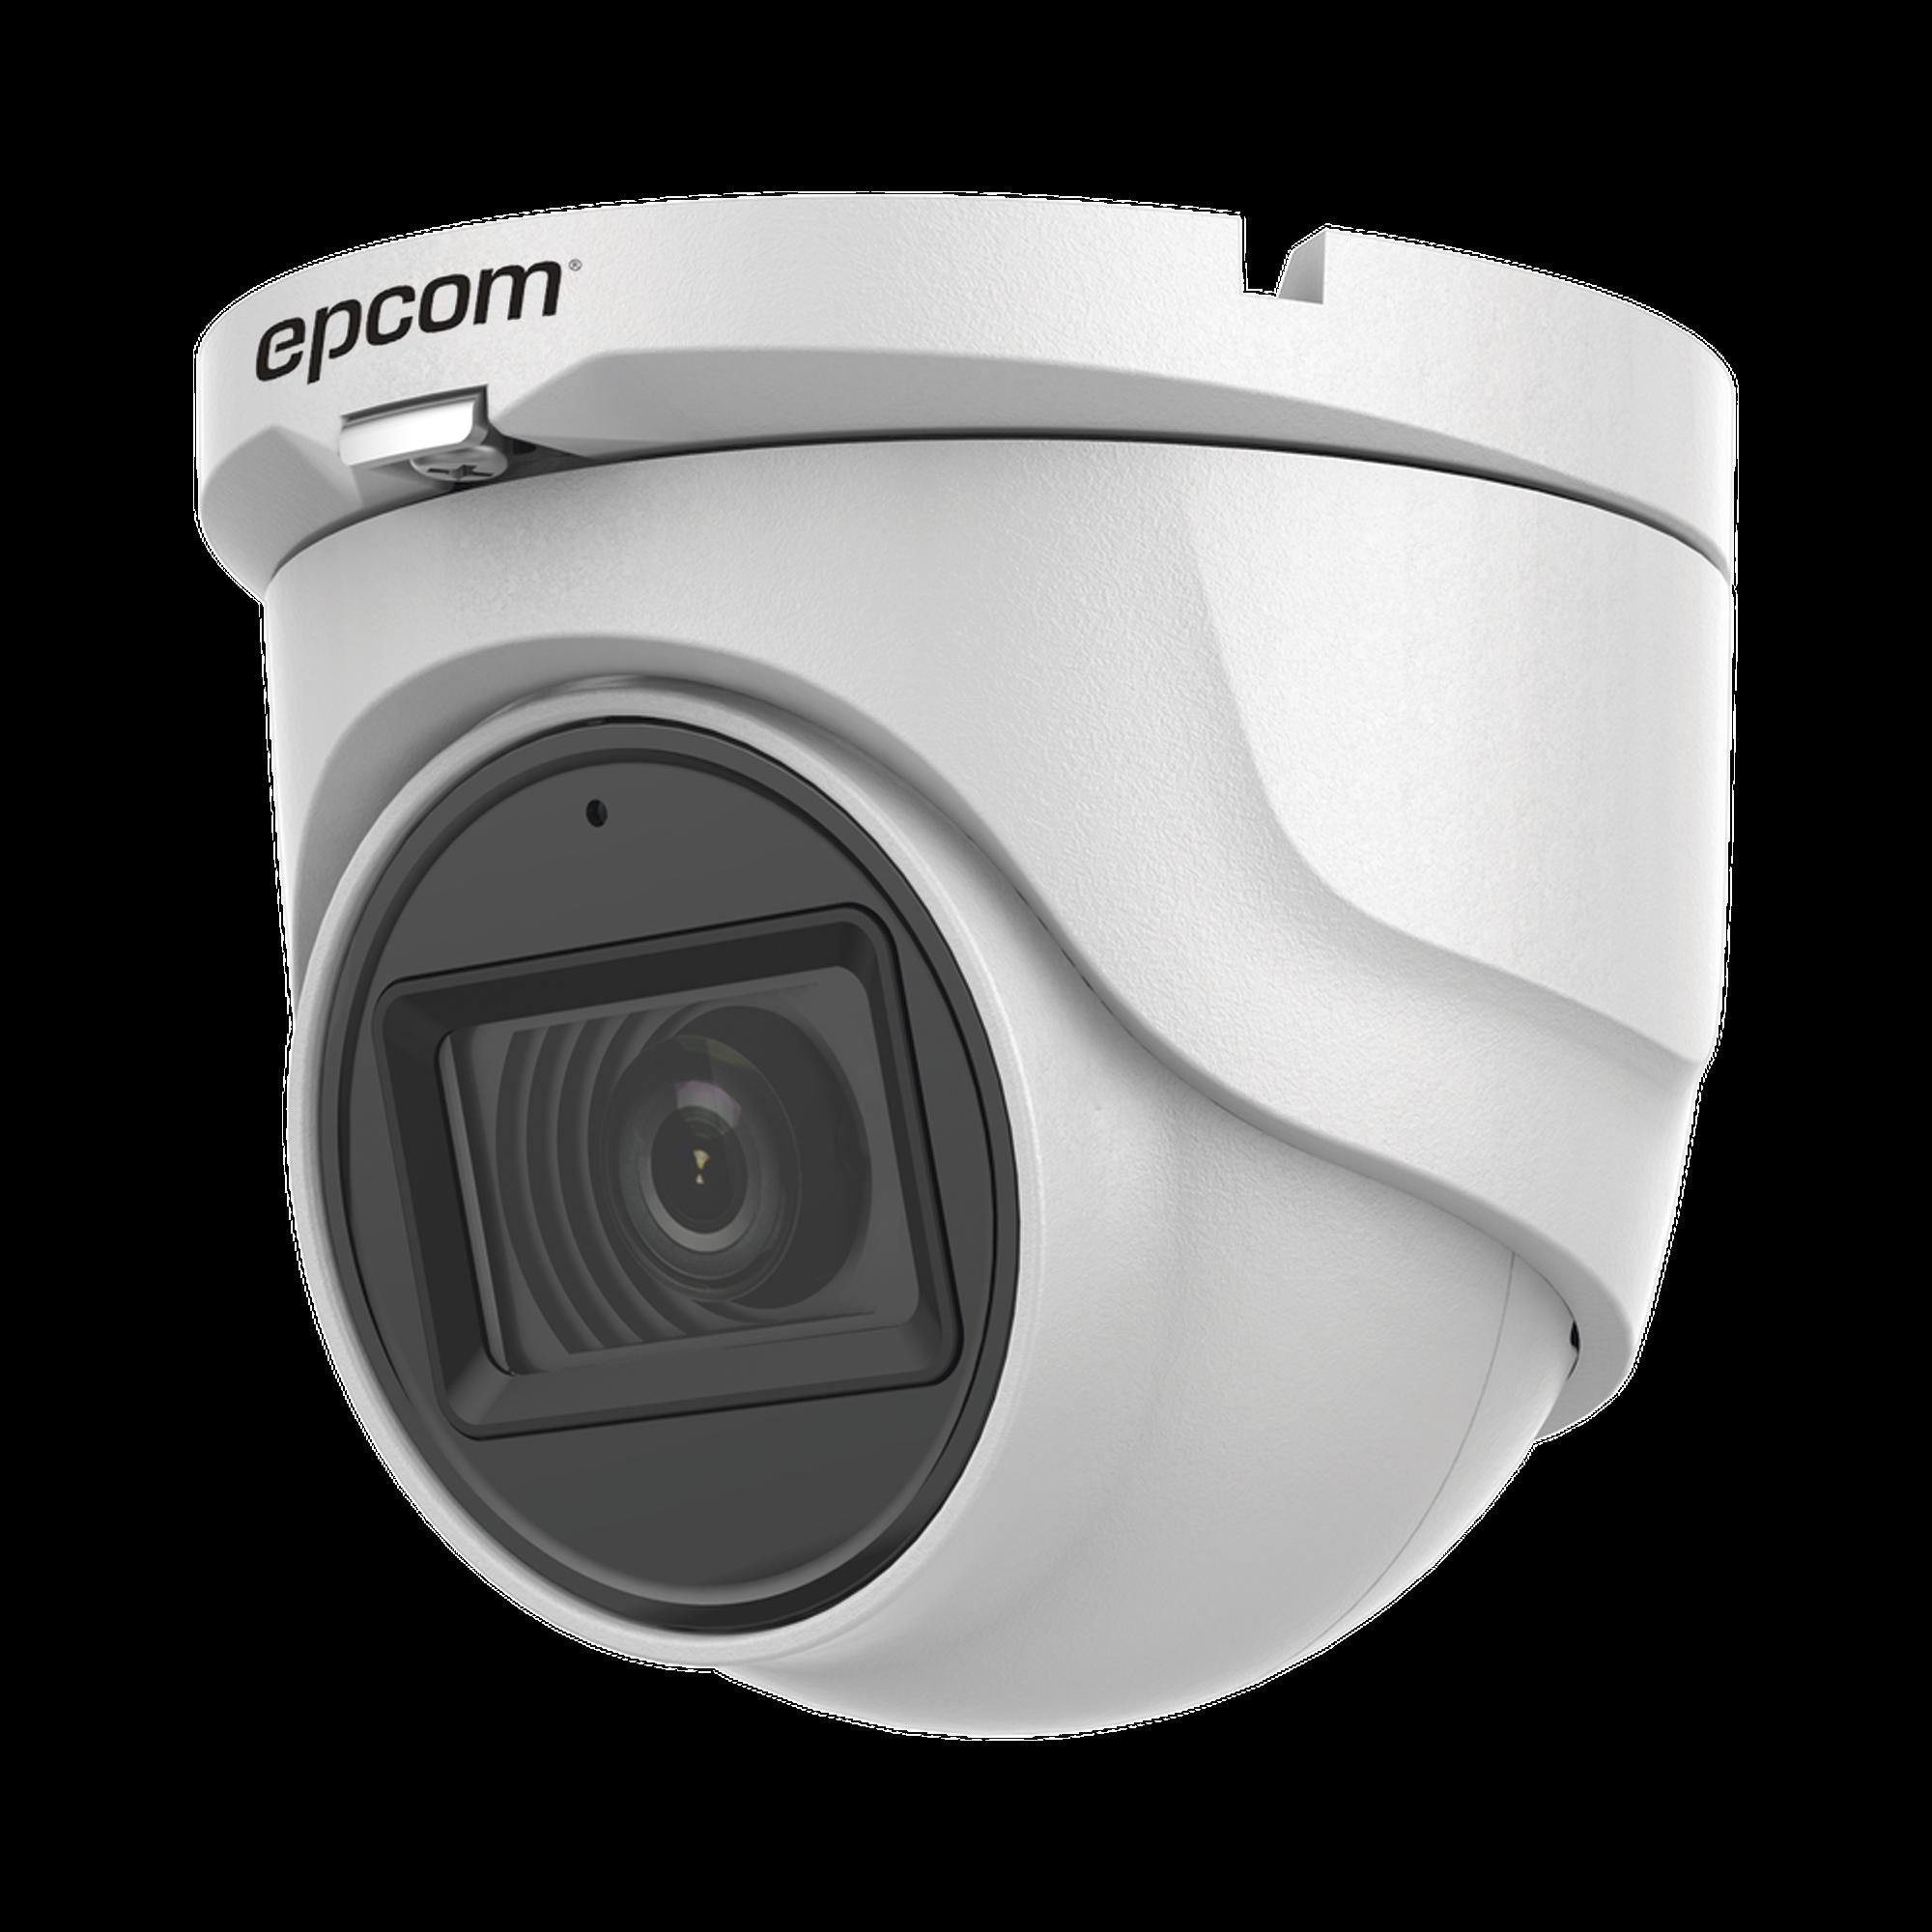 AUDIO POR COAXITRON / Turret TURBOHD 5 Megapixel / Angulo de vision 85.5? / Lente 2.8 mm / 30 mts IR EXIR / Exterior IP67 / 4 Tecnologías / dWDR